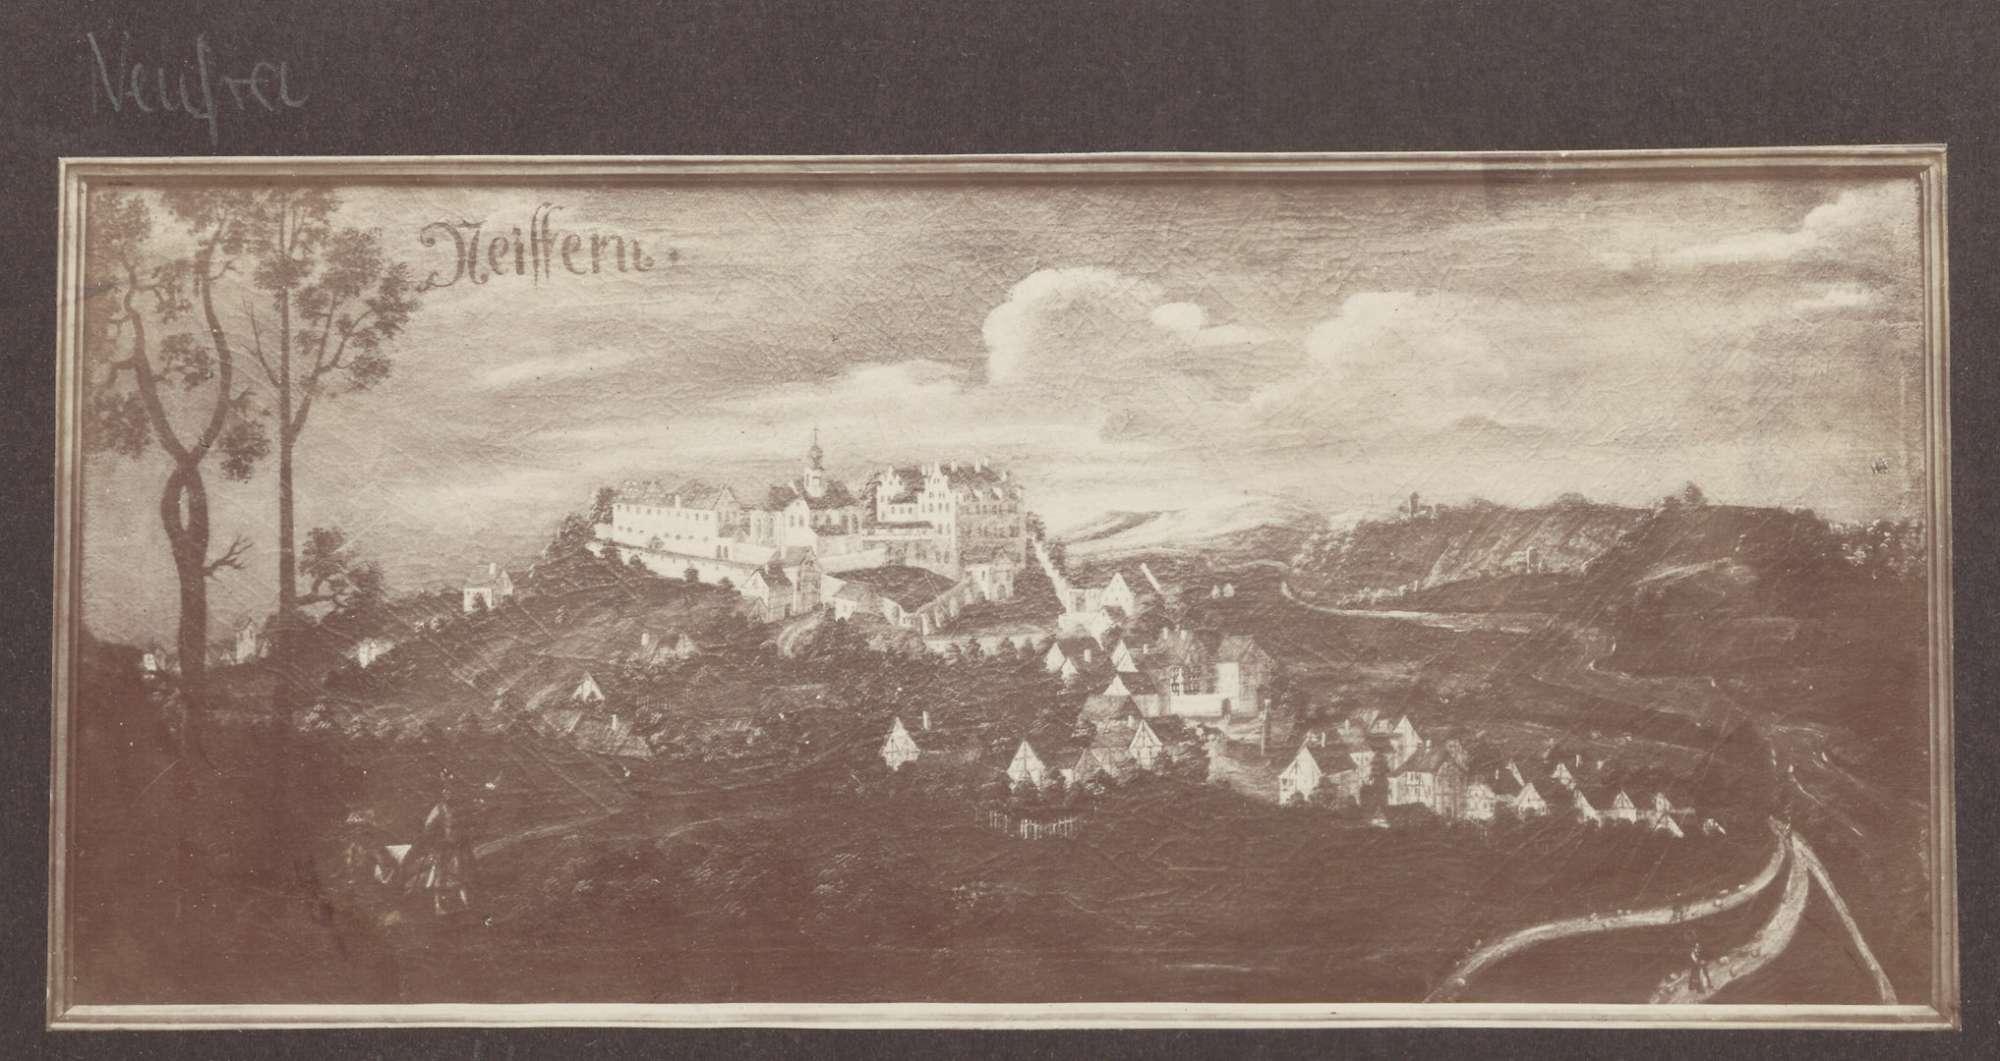 Neiffern [Neufra bei Riedlingen], Bild 1